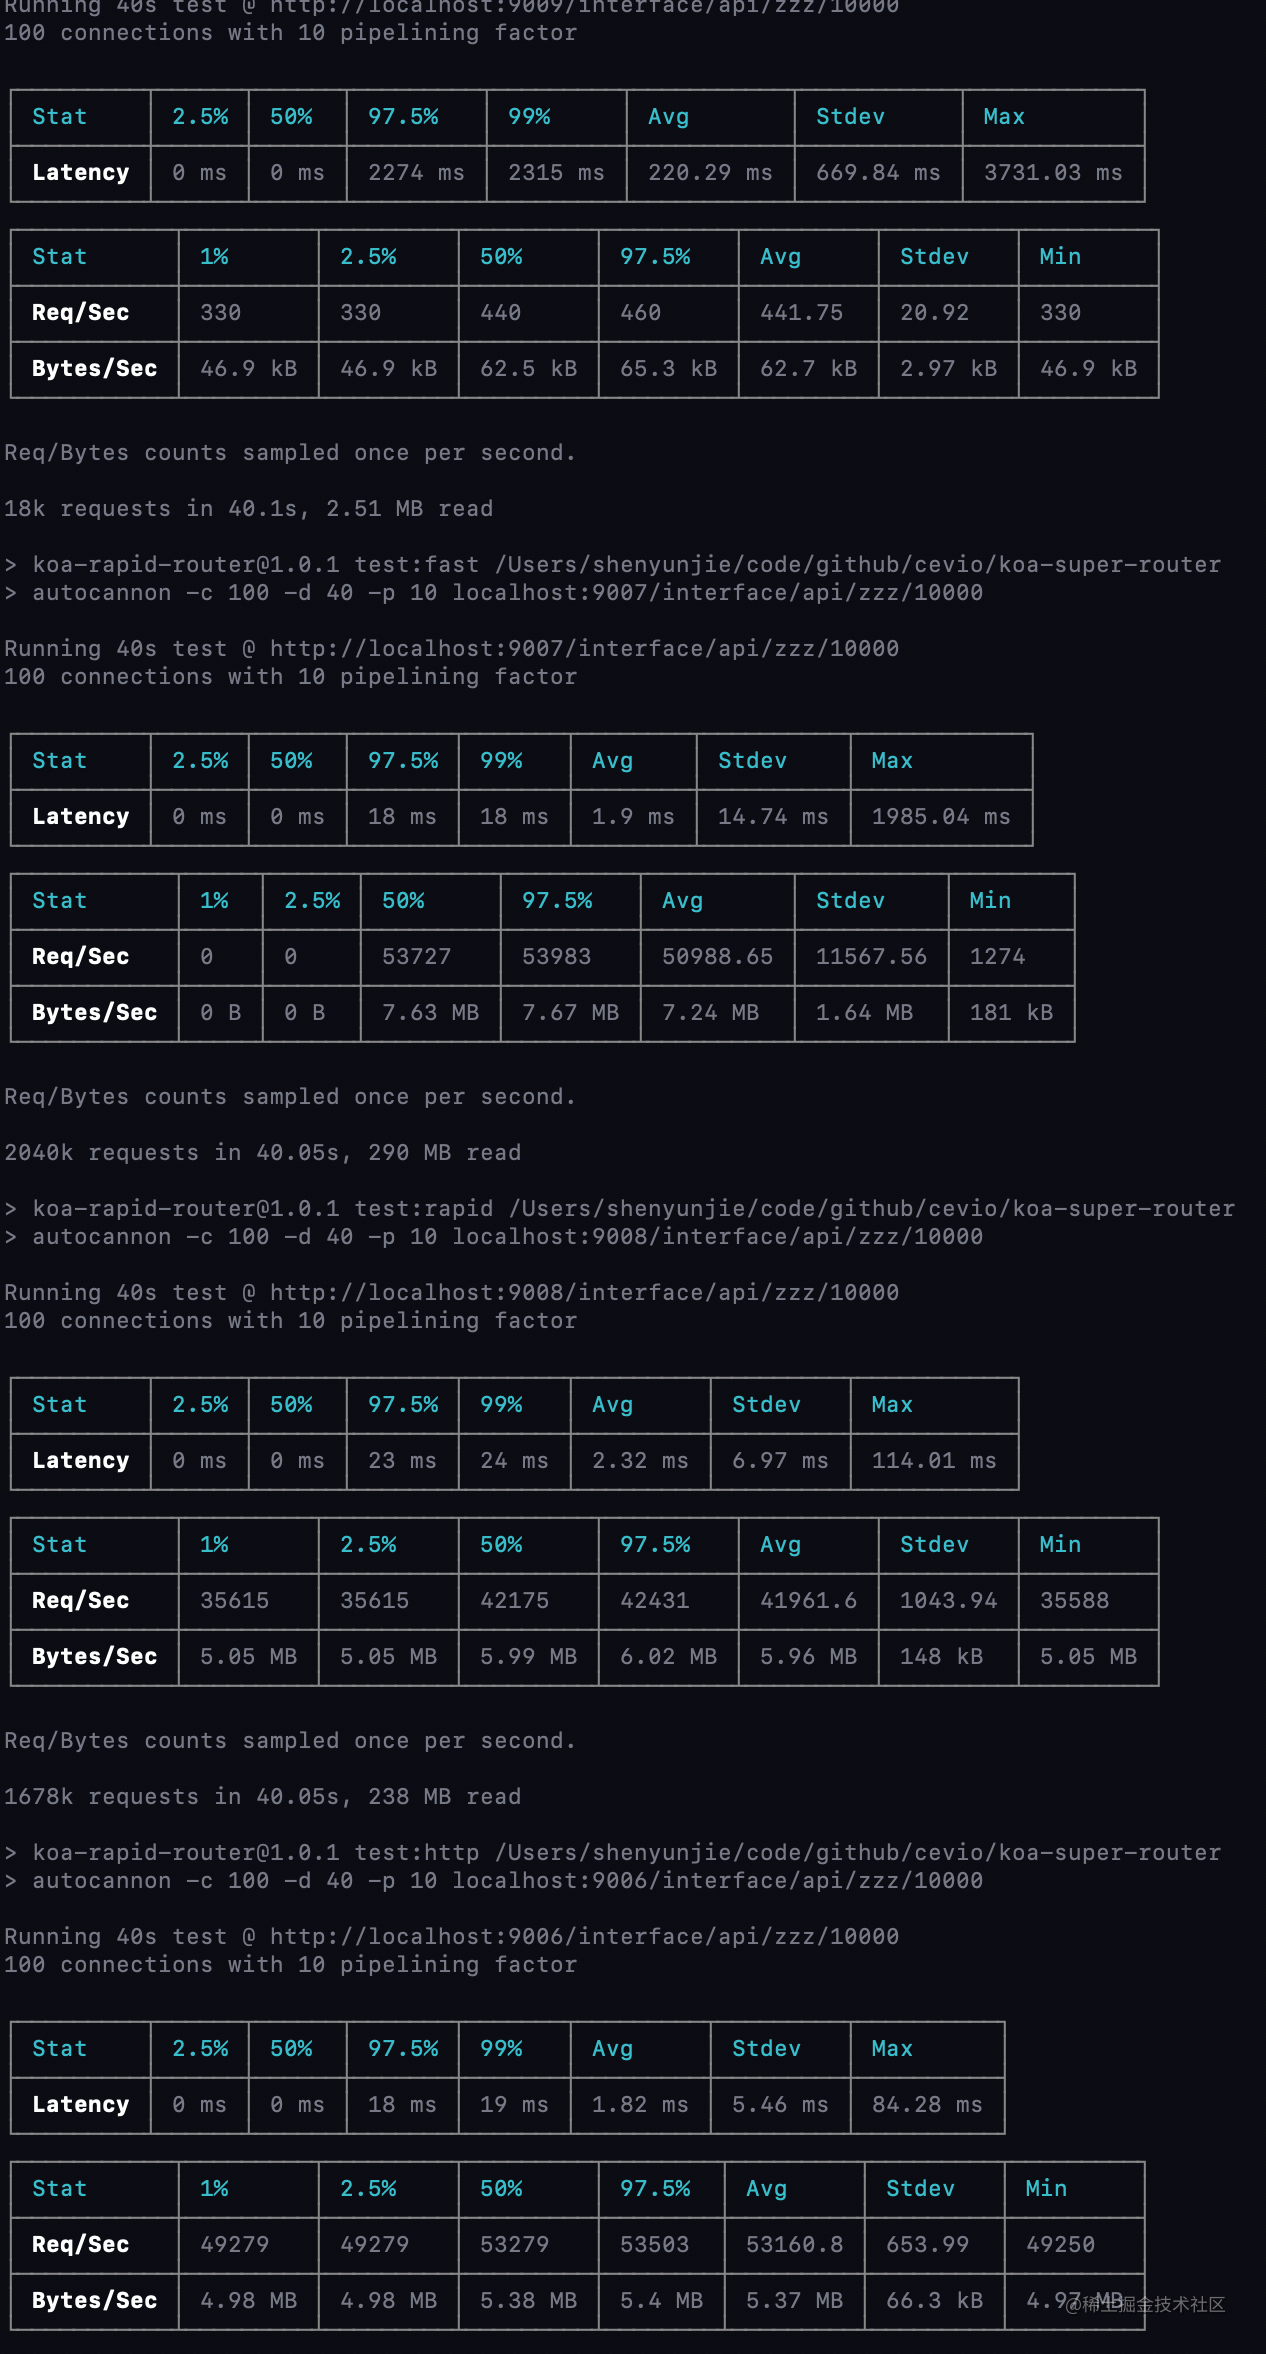 koa-rapid-router:dynamic